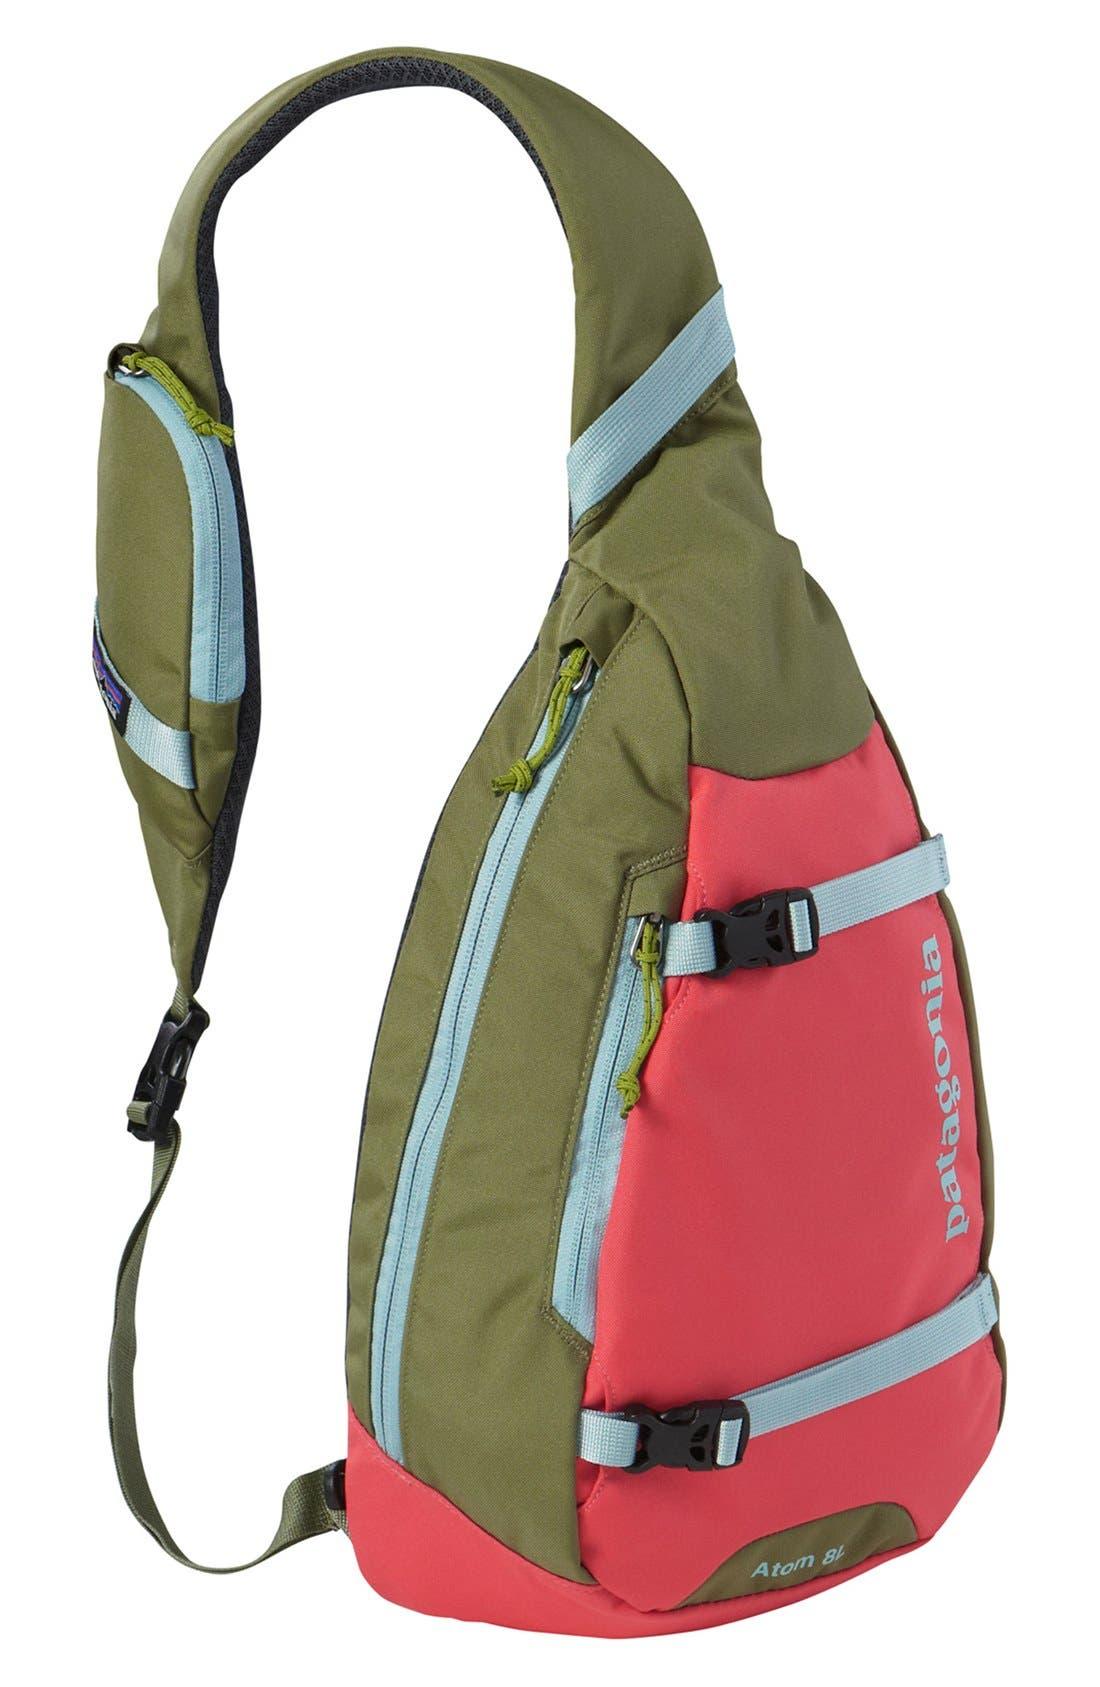 Alternate Image 1 Selected - Patagonia 'Atom' Sling Backpack